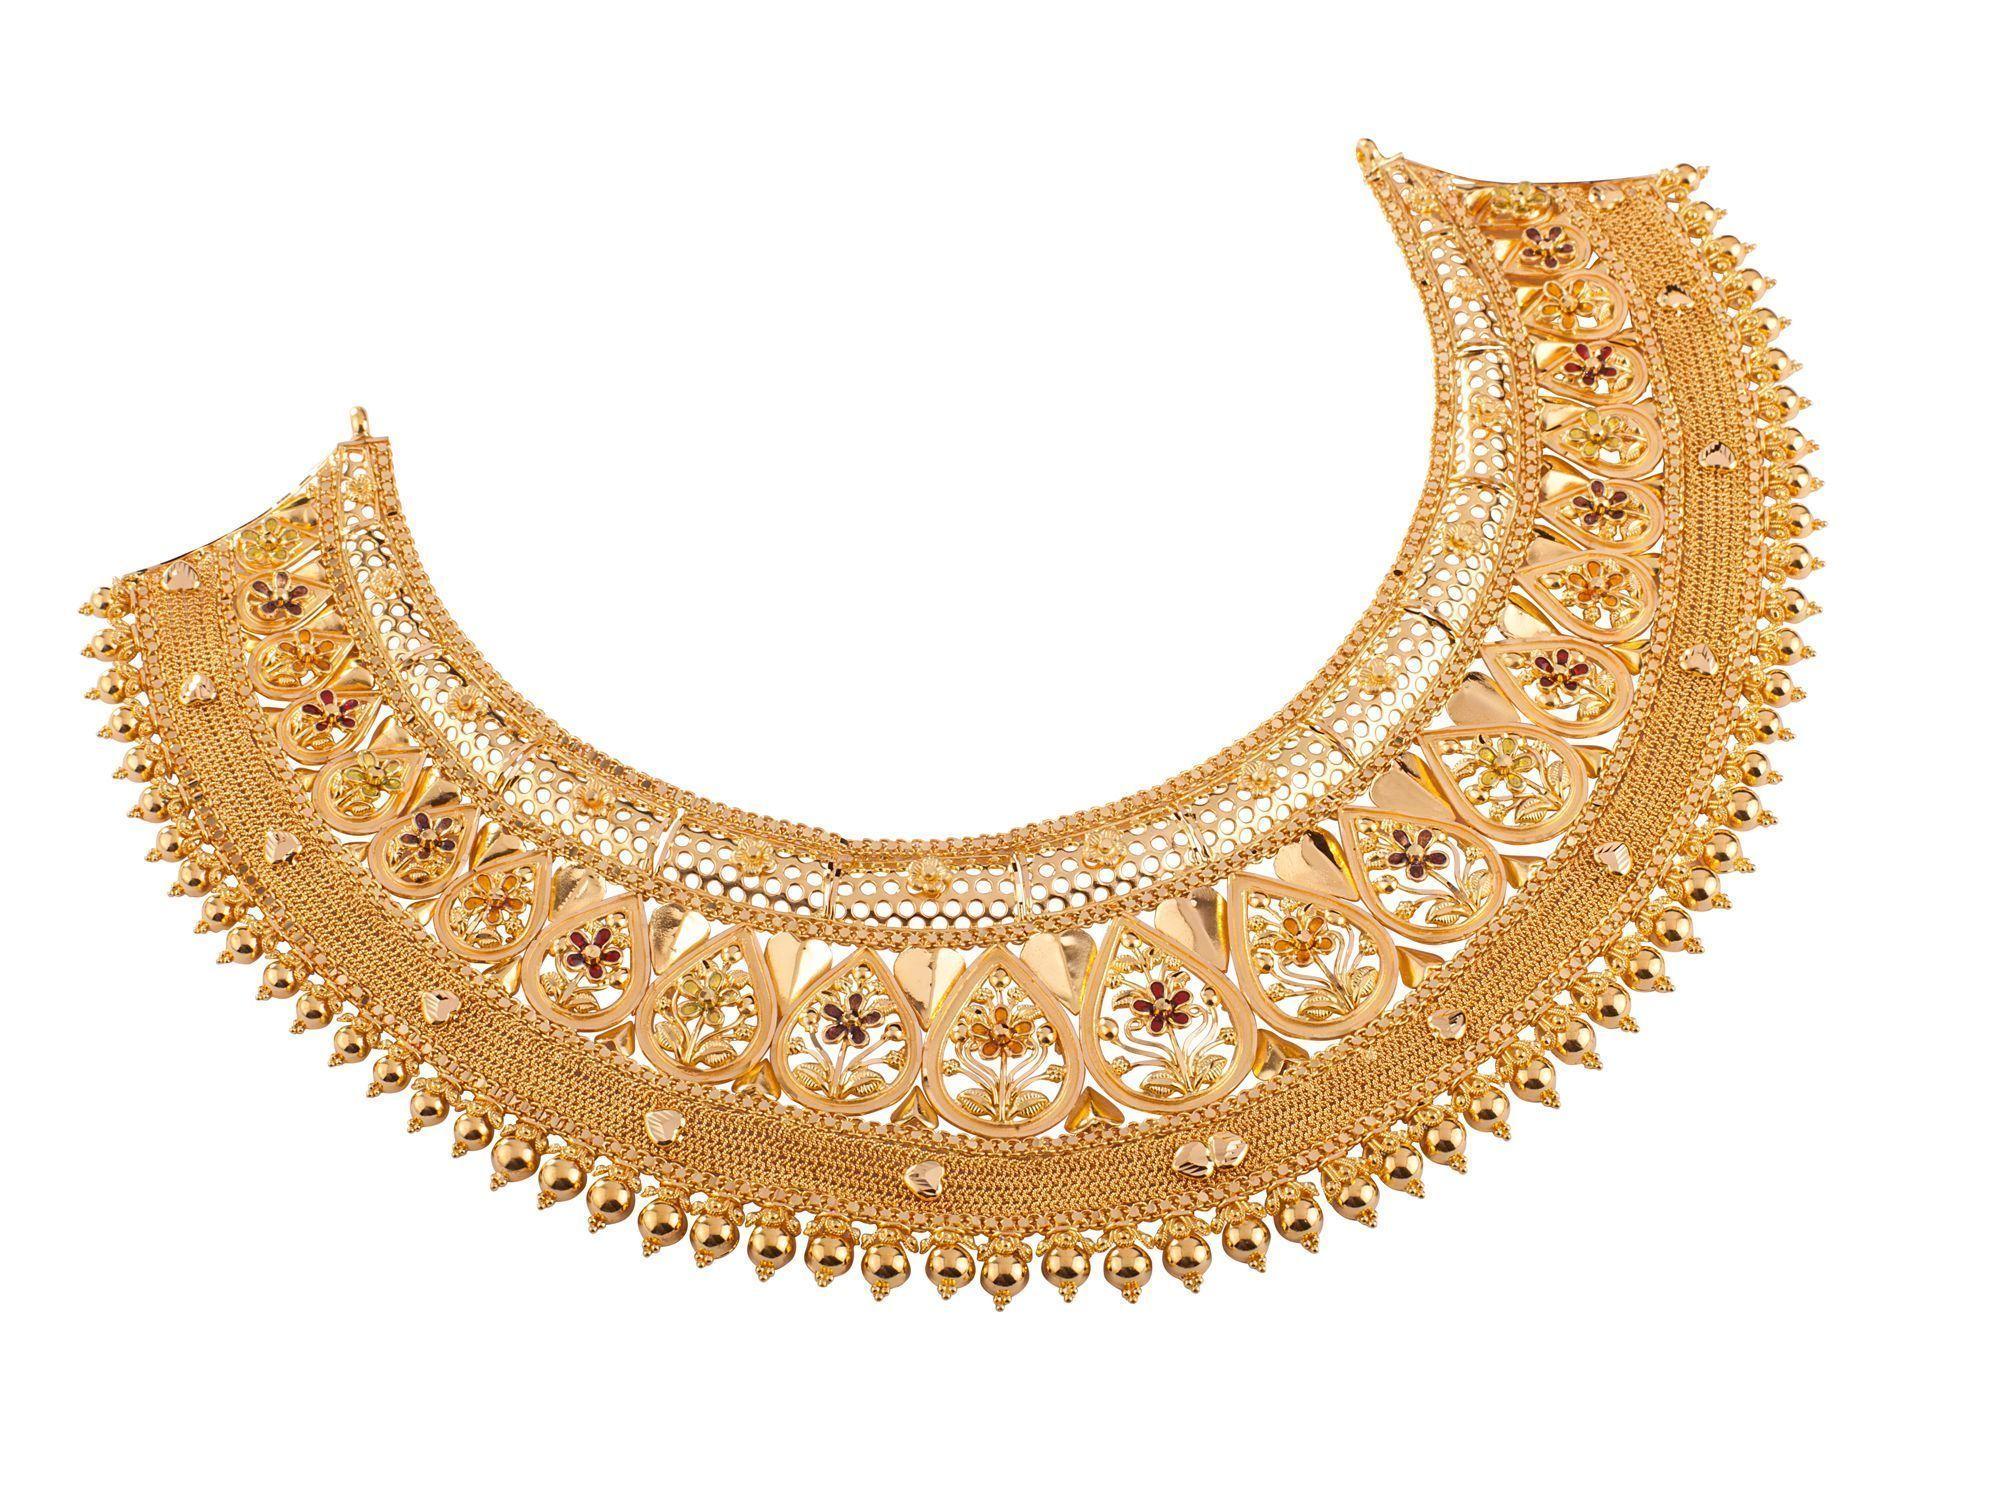 Senco Gold Bangle Google Search Sencogoldjewellery Bridal Gold Jewellery Gold Necklace Indian Bridal Jewelry Gold Bangles